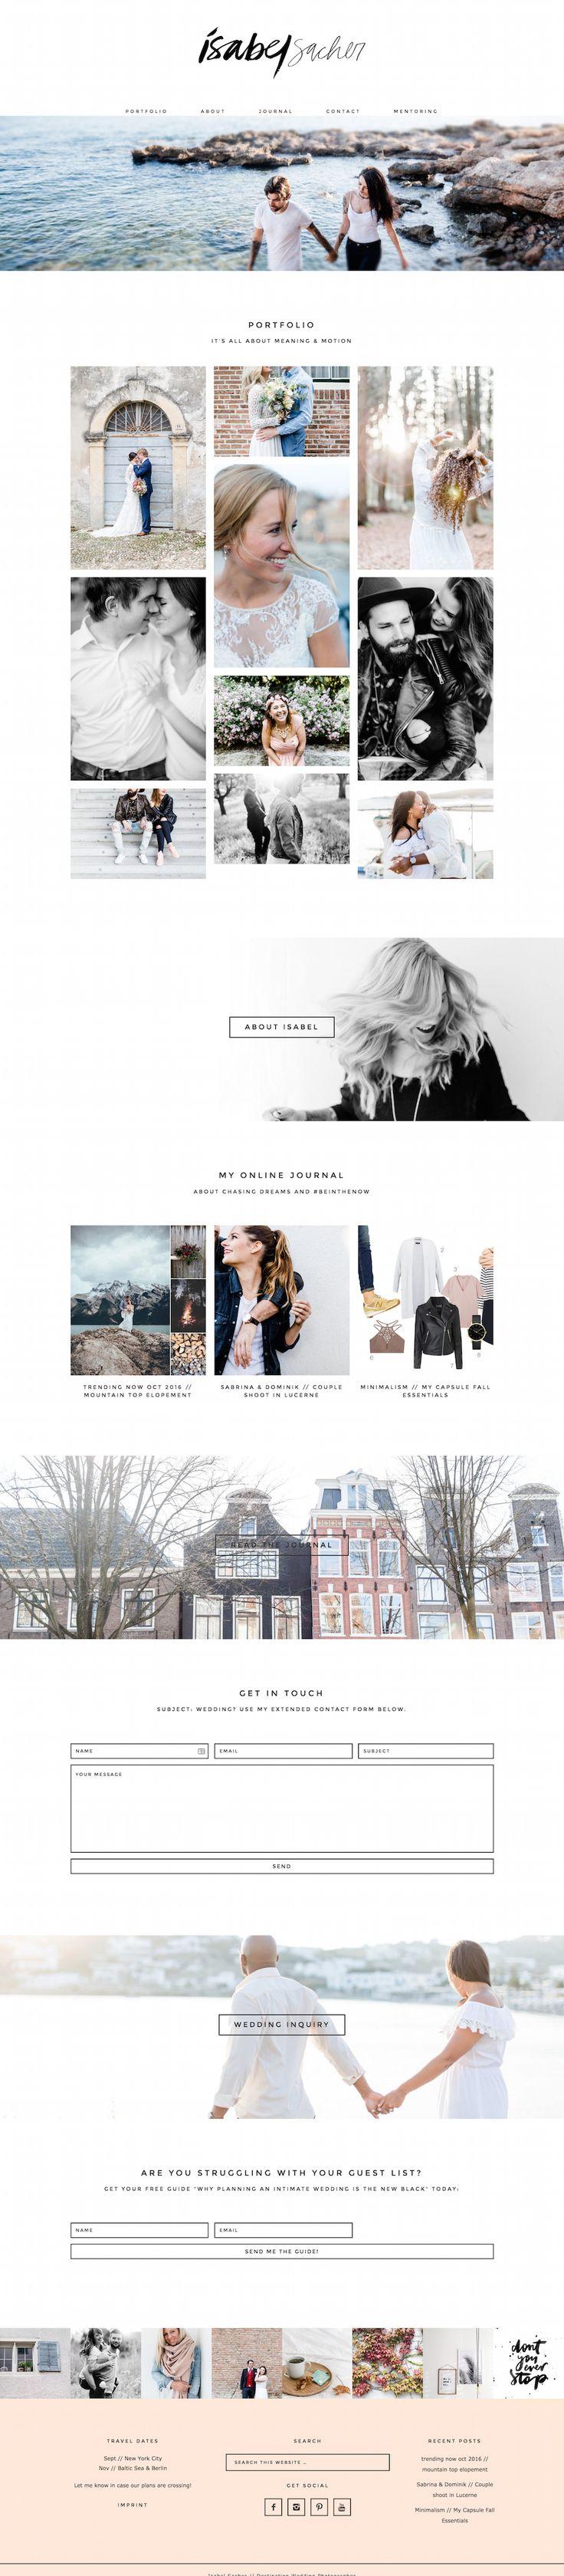 We love Isabel Sacher's Photography site running on Station Seven's Coastal WordPress theme.